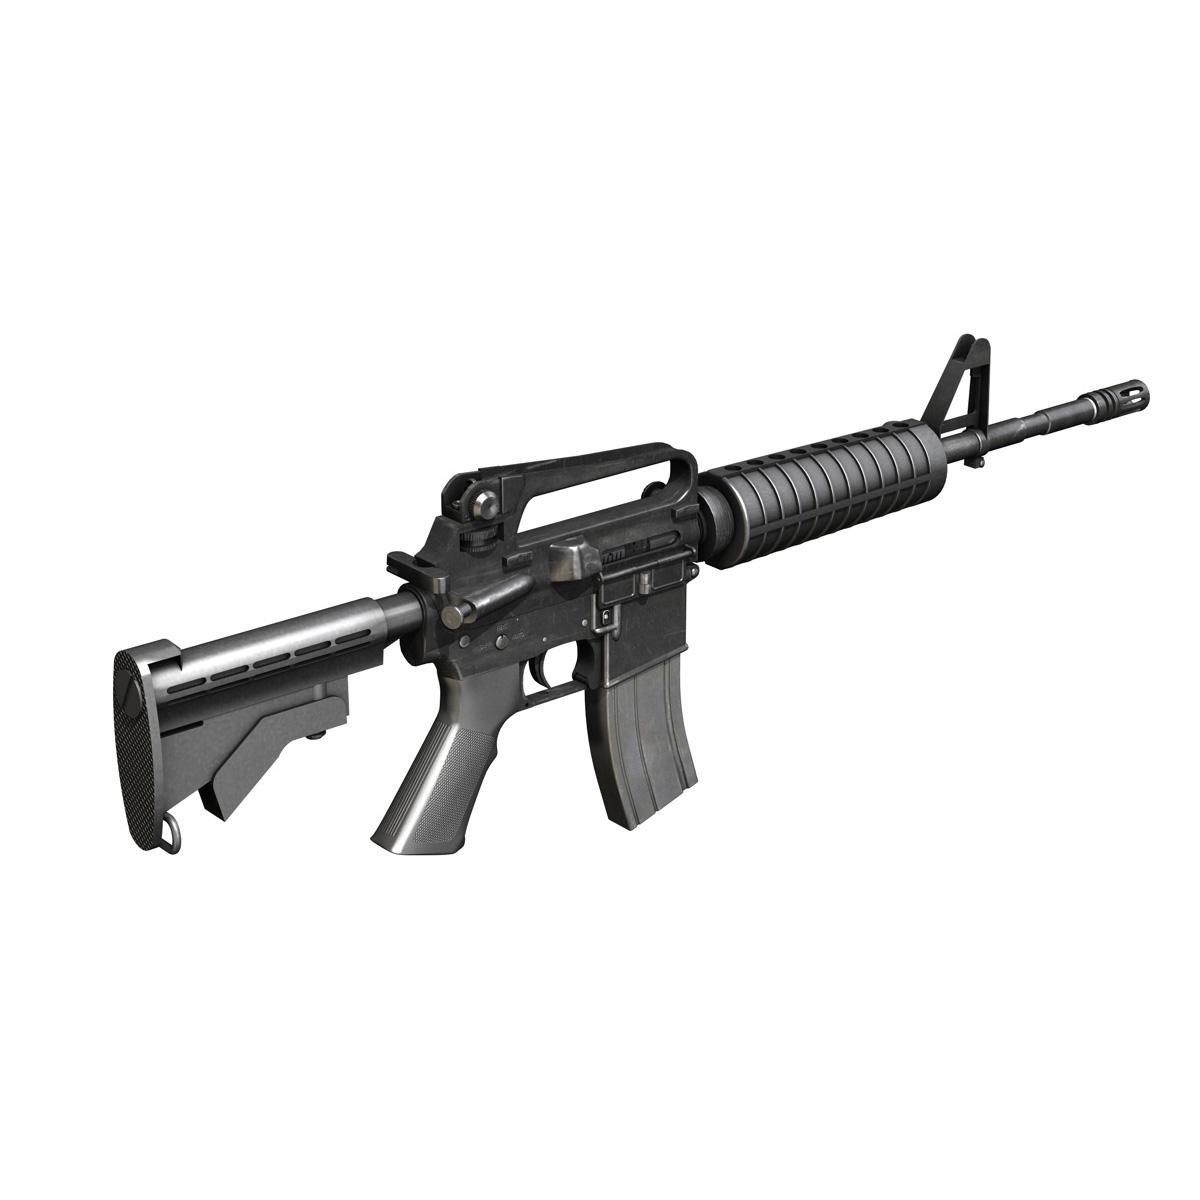 colt m4a1 carbine довтолгооны буу 3d загвар 3ds fbx c4d lwo obj 187790